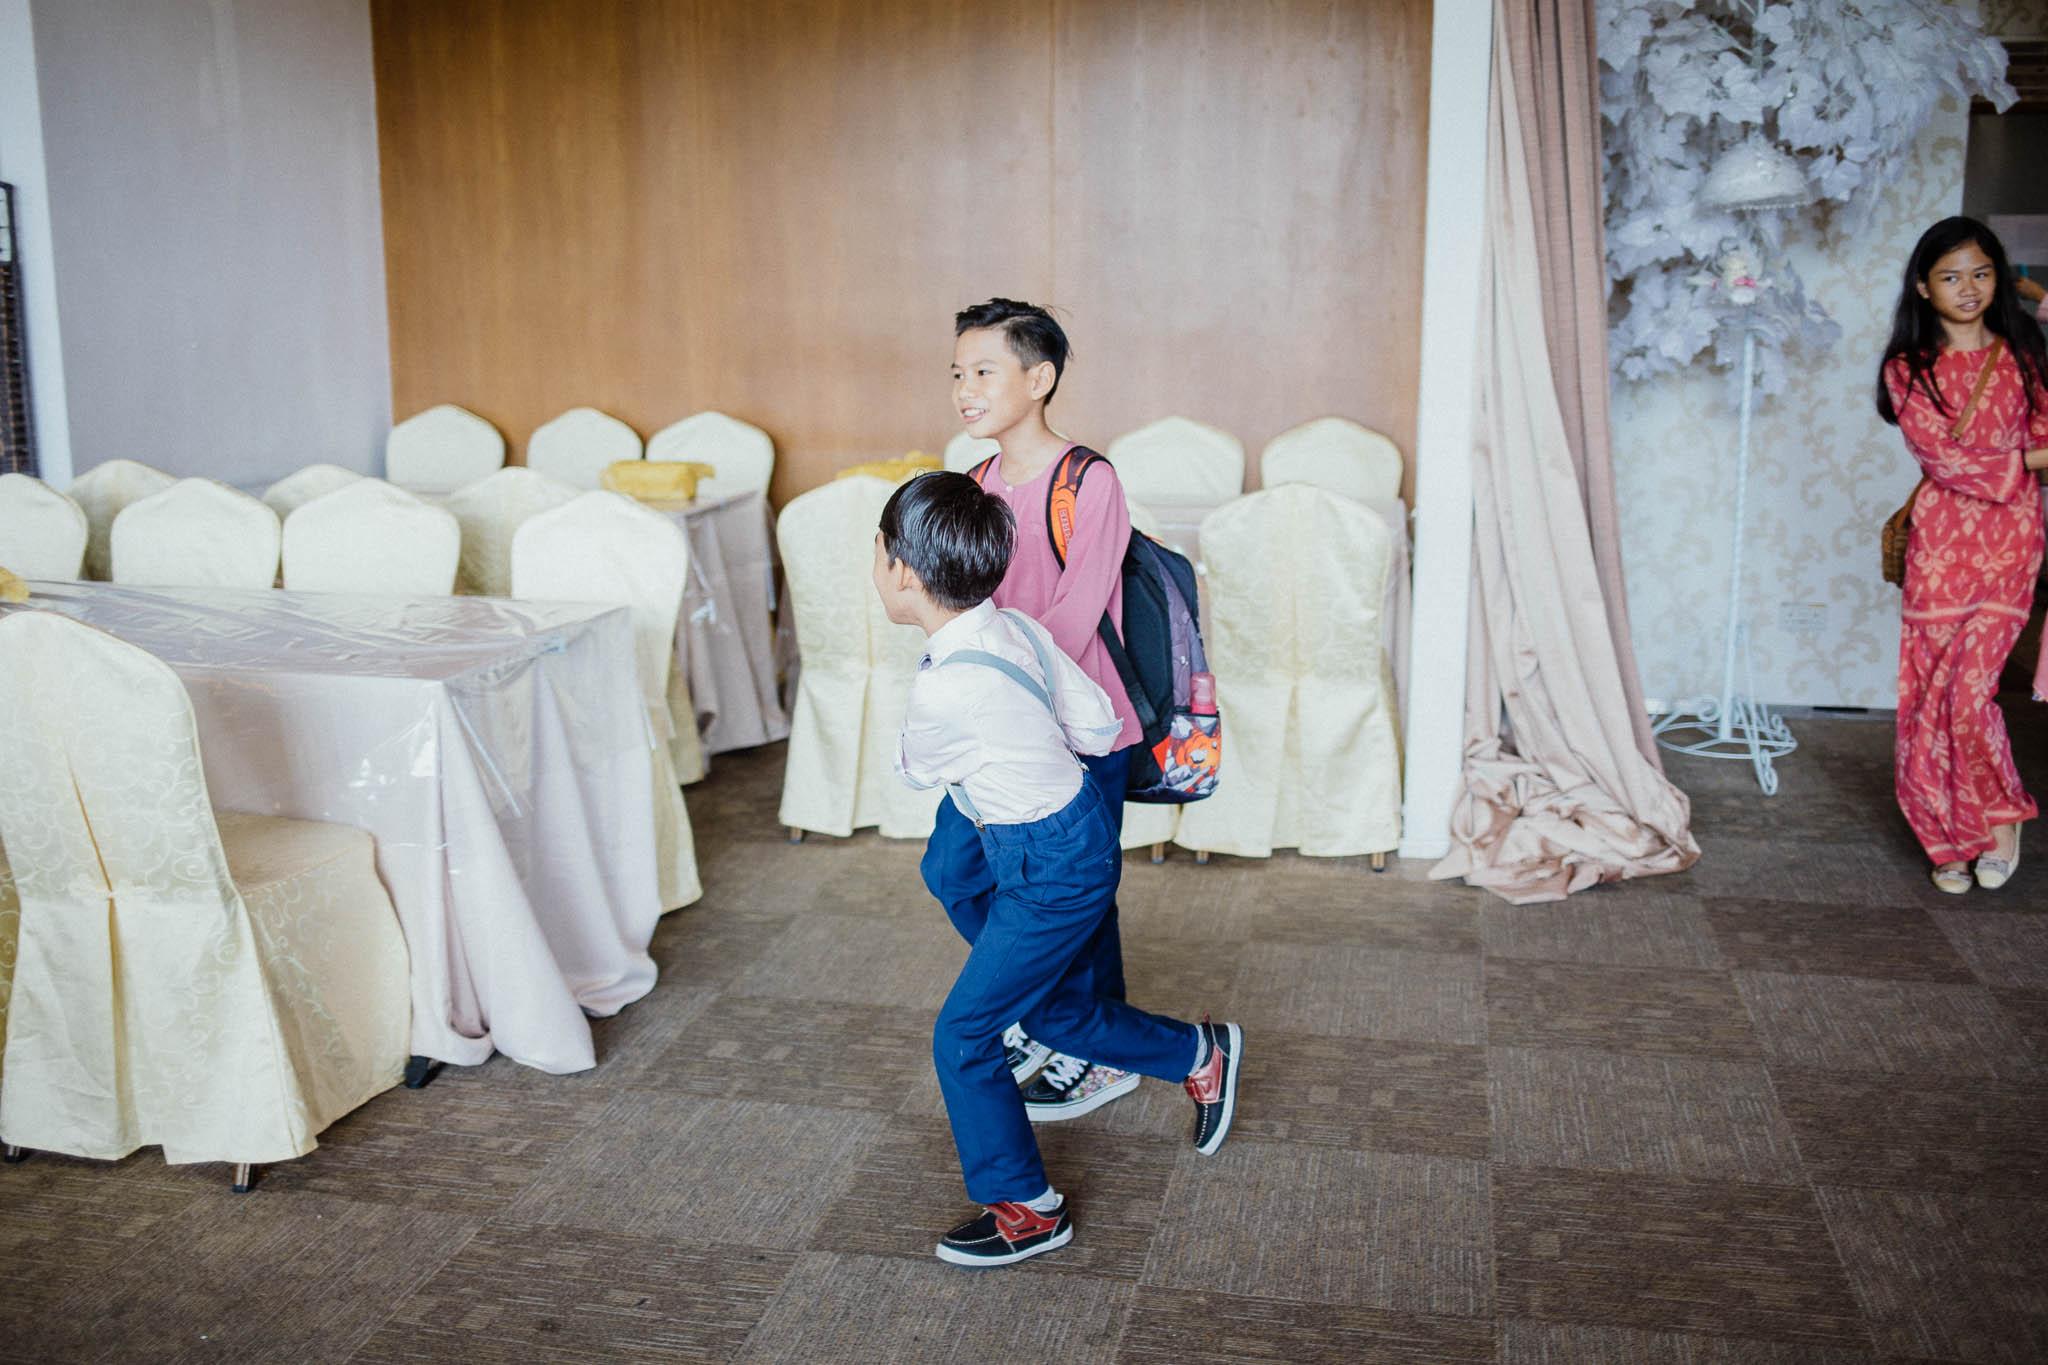 singapore-wedding-photographer-addafiq-nufail-004.jpg